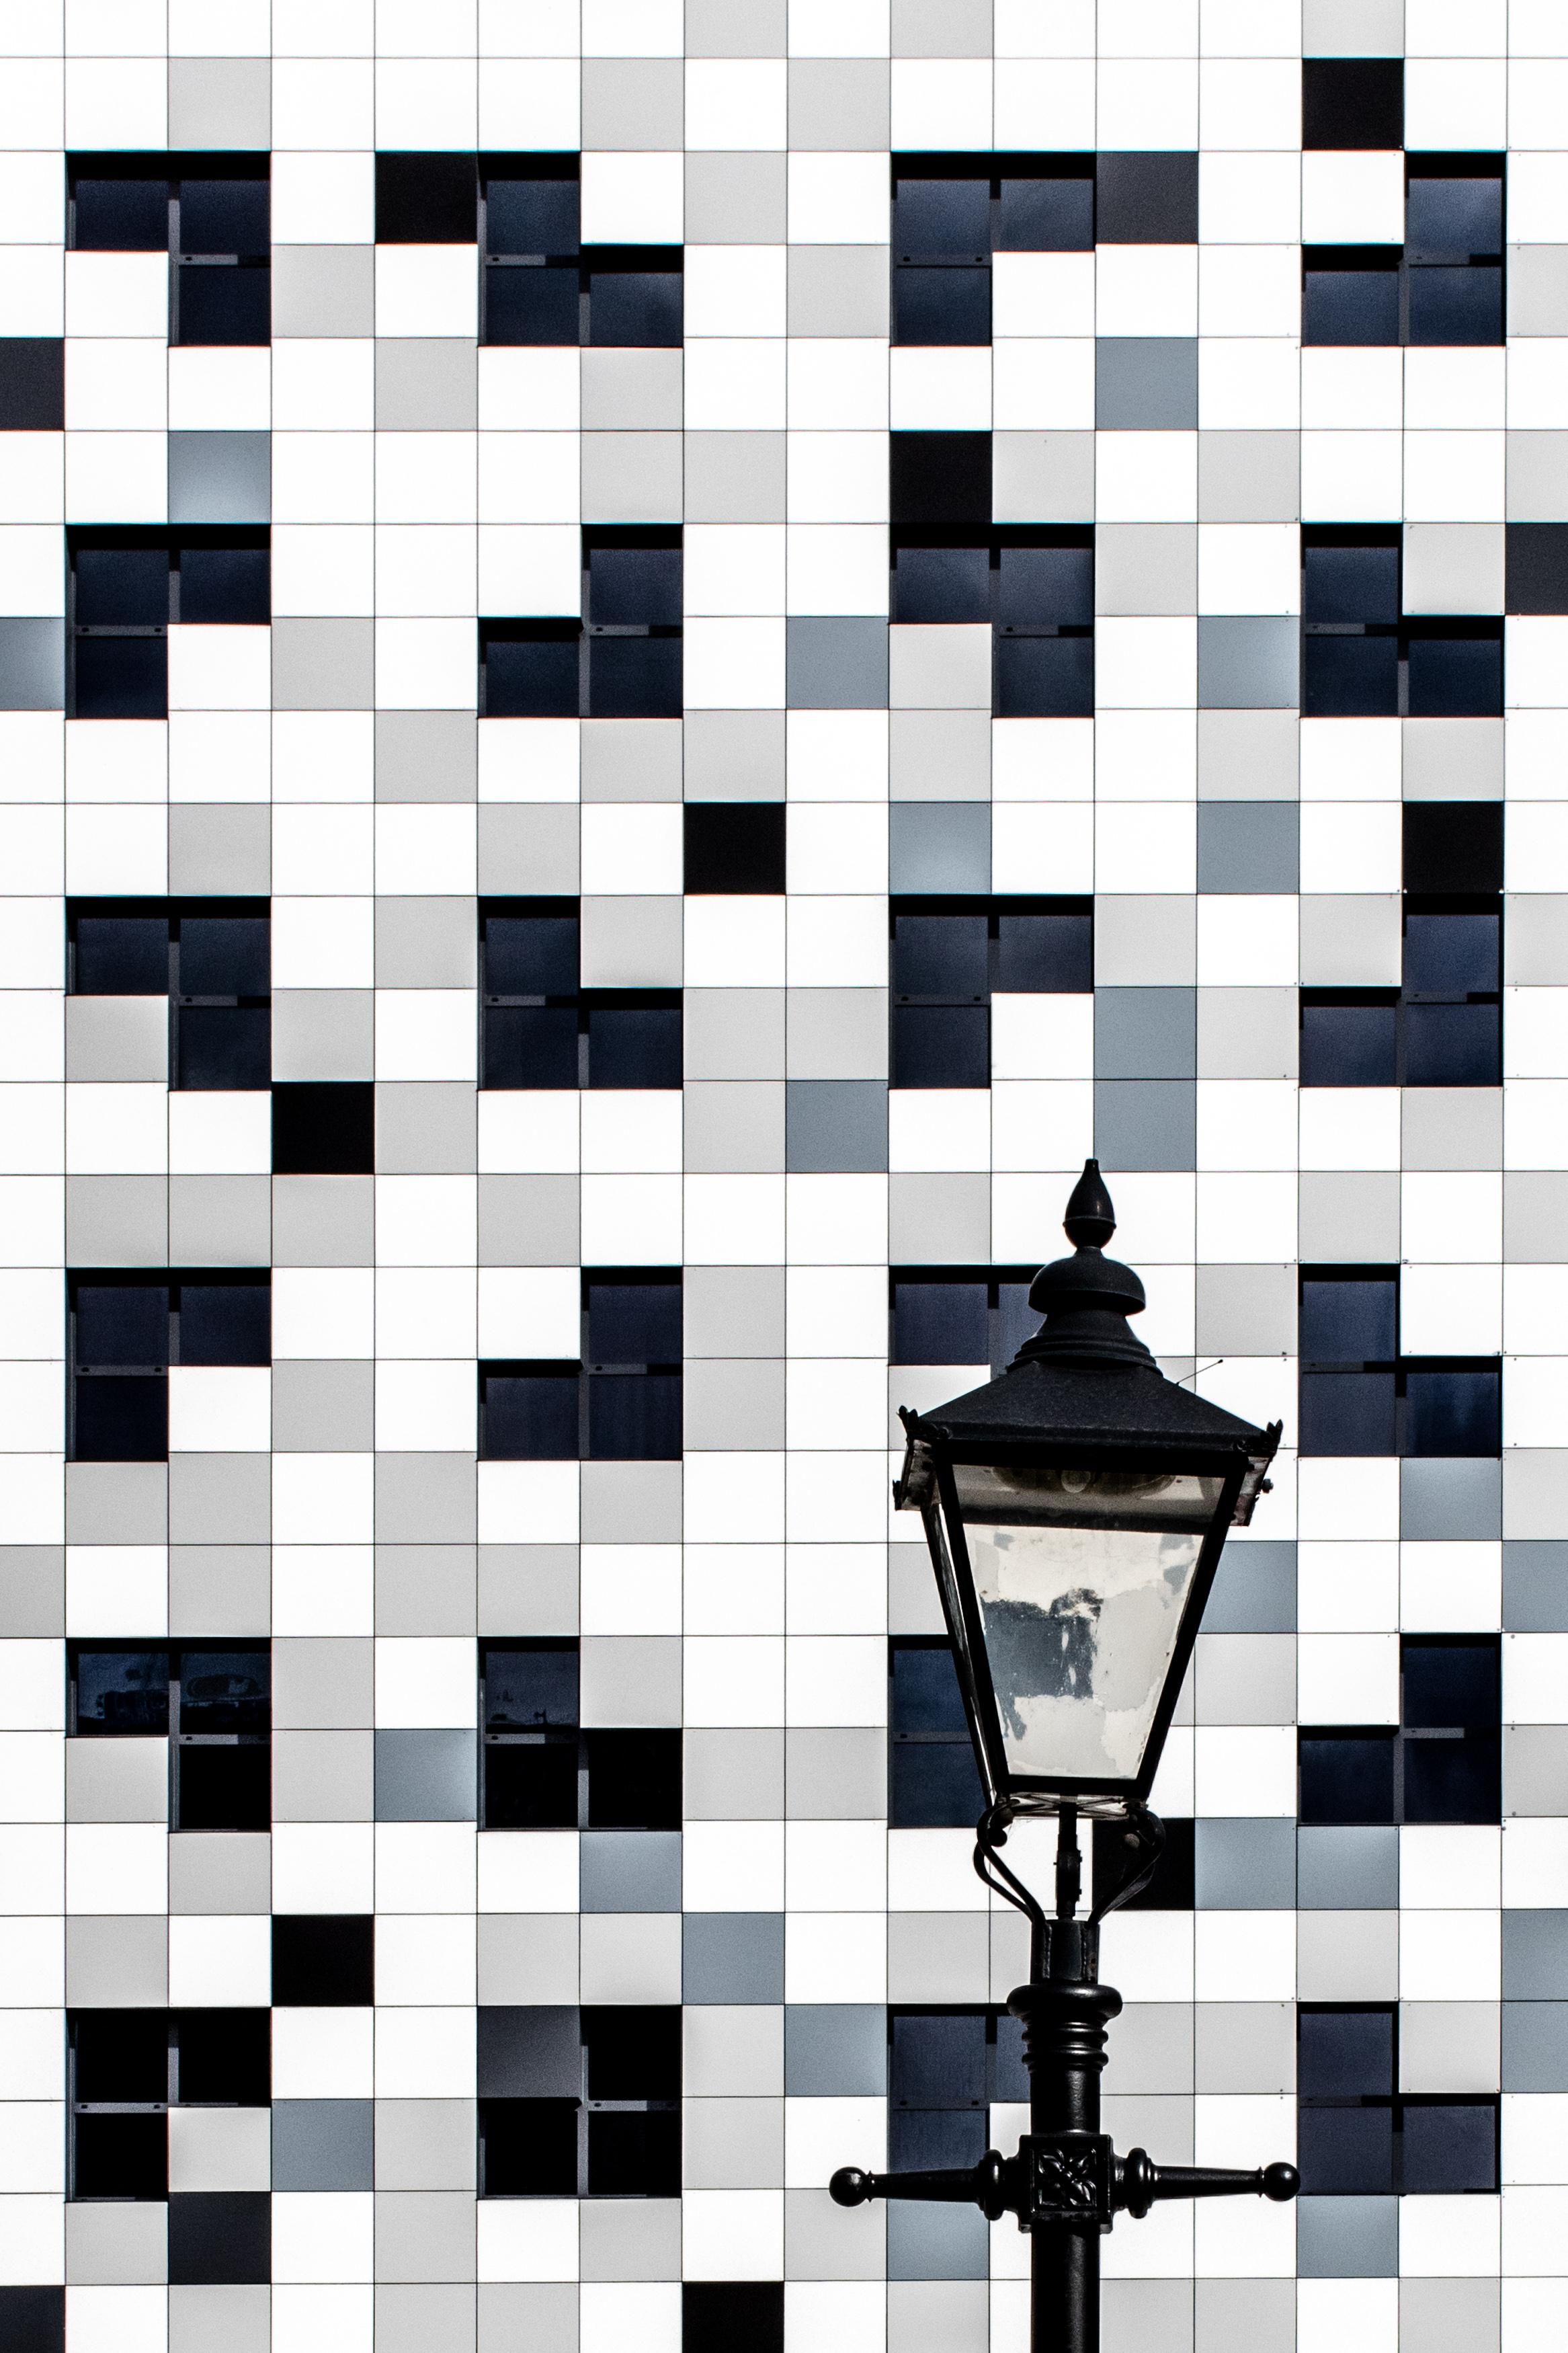 tetris_32555950064_o.jpg